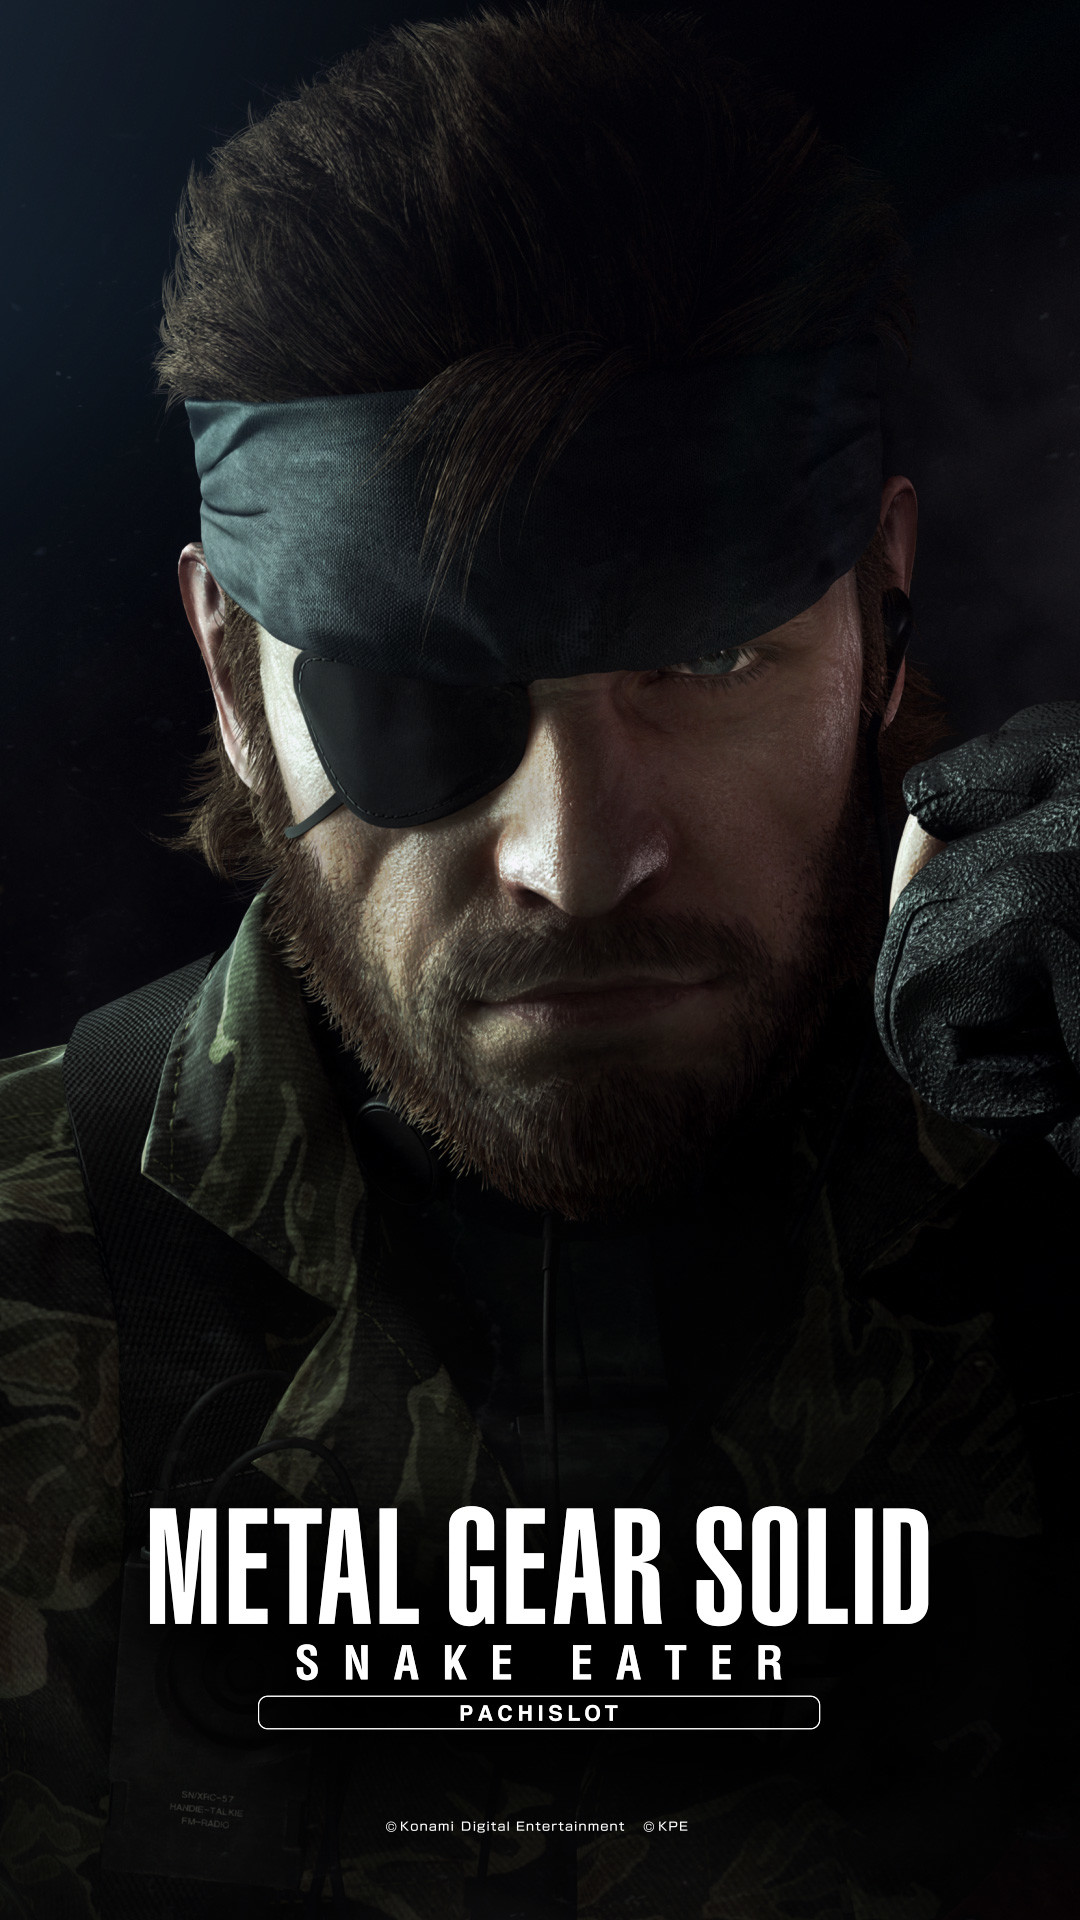 Cat version of Big Boss (Metal Gear Solid V: The Phantom Pain)   News of  video game   Pinterest   Big boss metal gear, Metal gear solid and Metal  gear